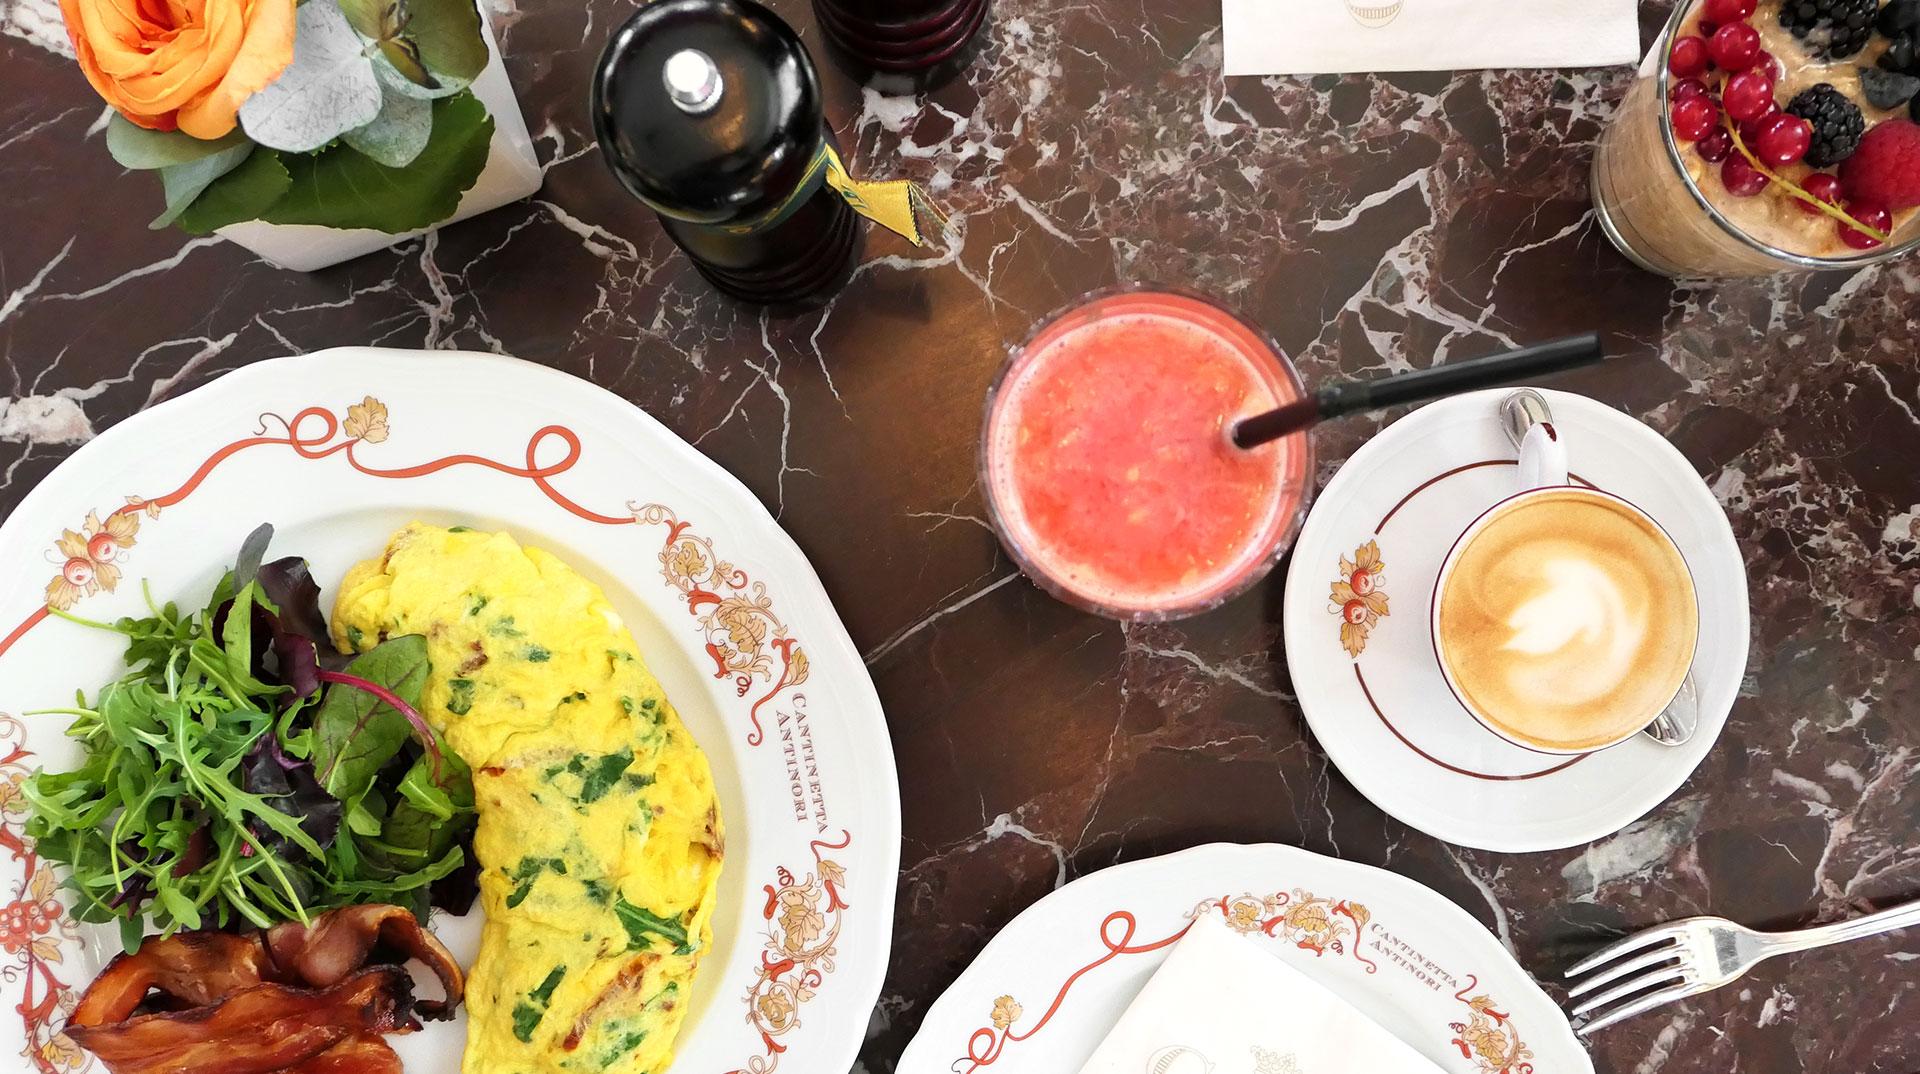 Cantinetta Antinori | Riccardo Giraudi | Tuscan Cuisine | Brunch